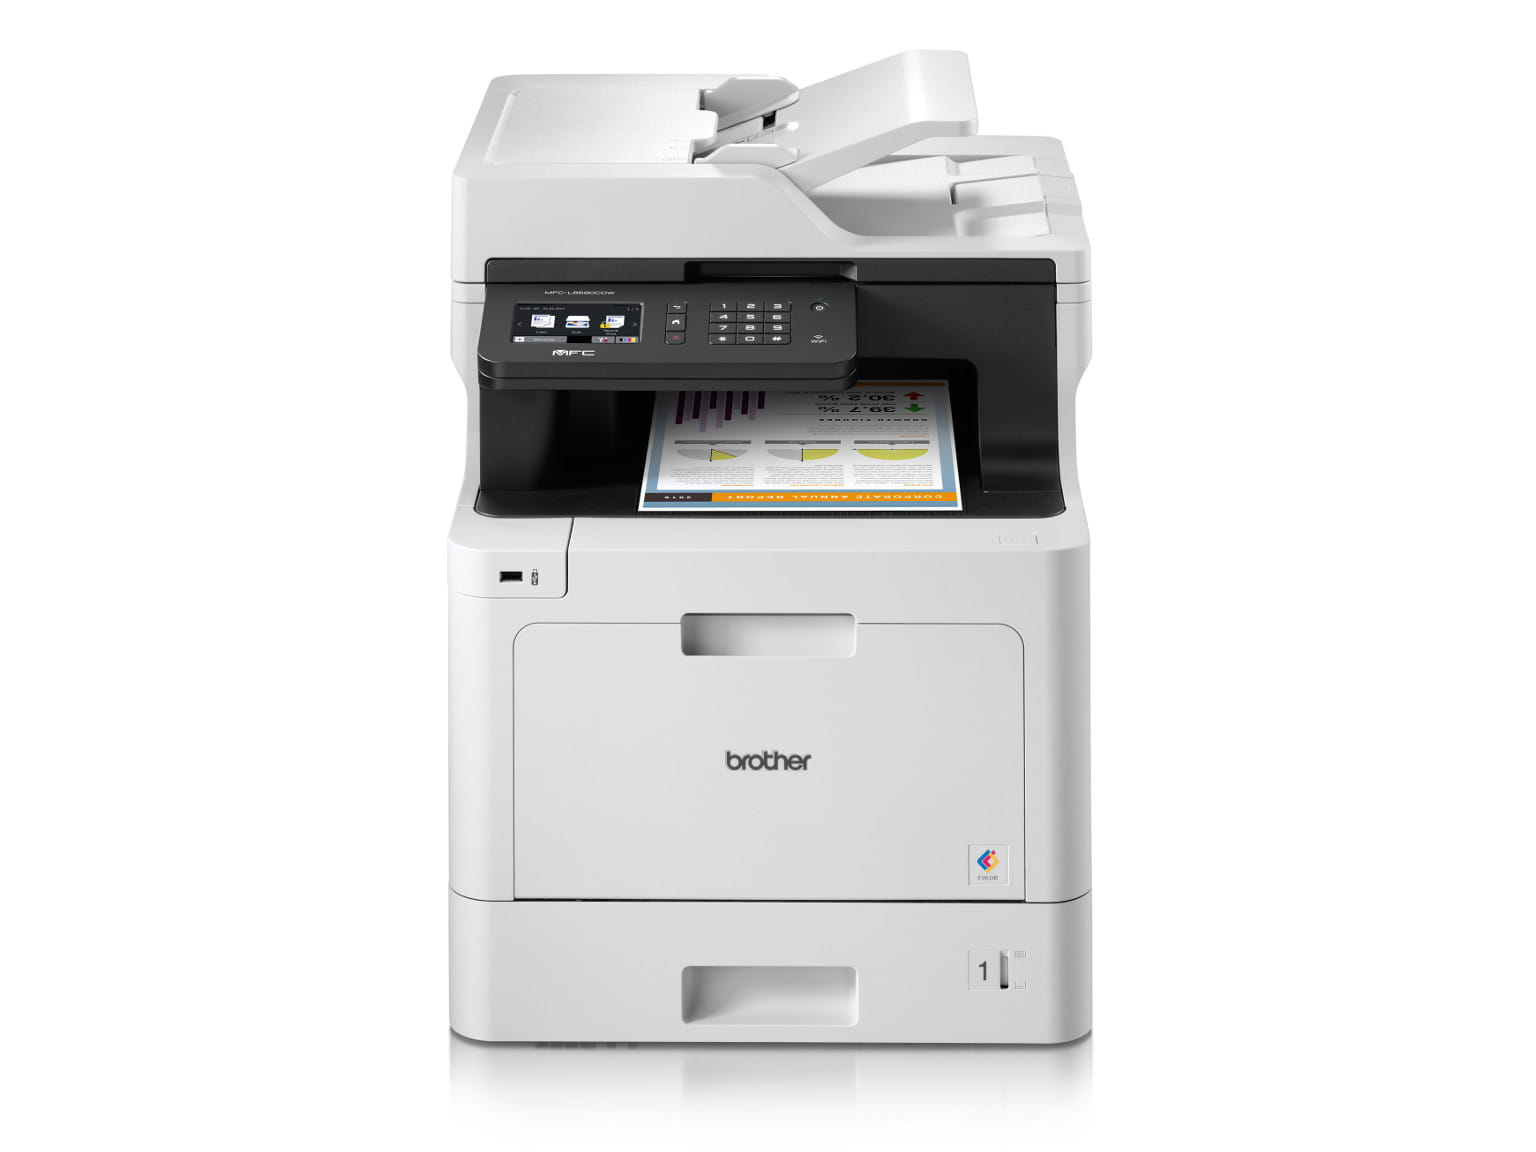 Impressora multifunções laser a cor MFC-L8690CDW Brother